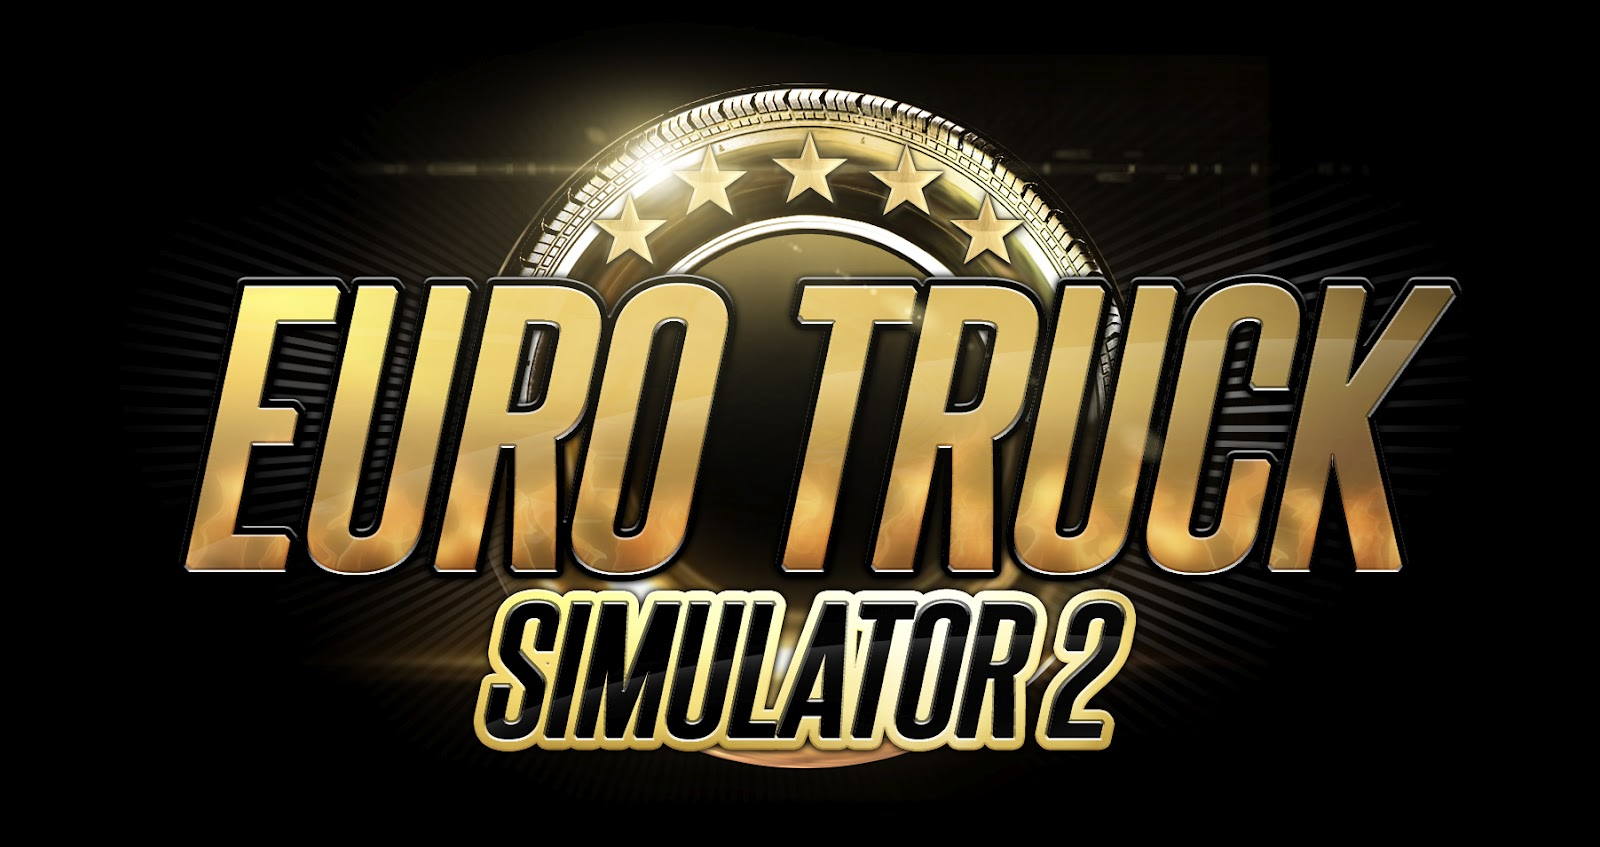 euro+truck+simulator+2+inceleme.jpg